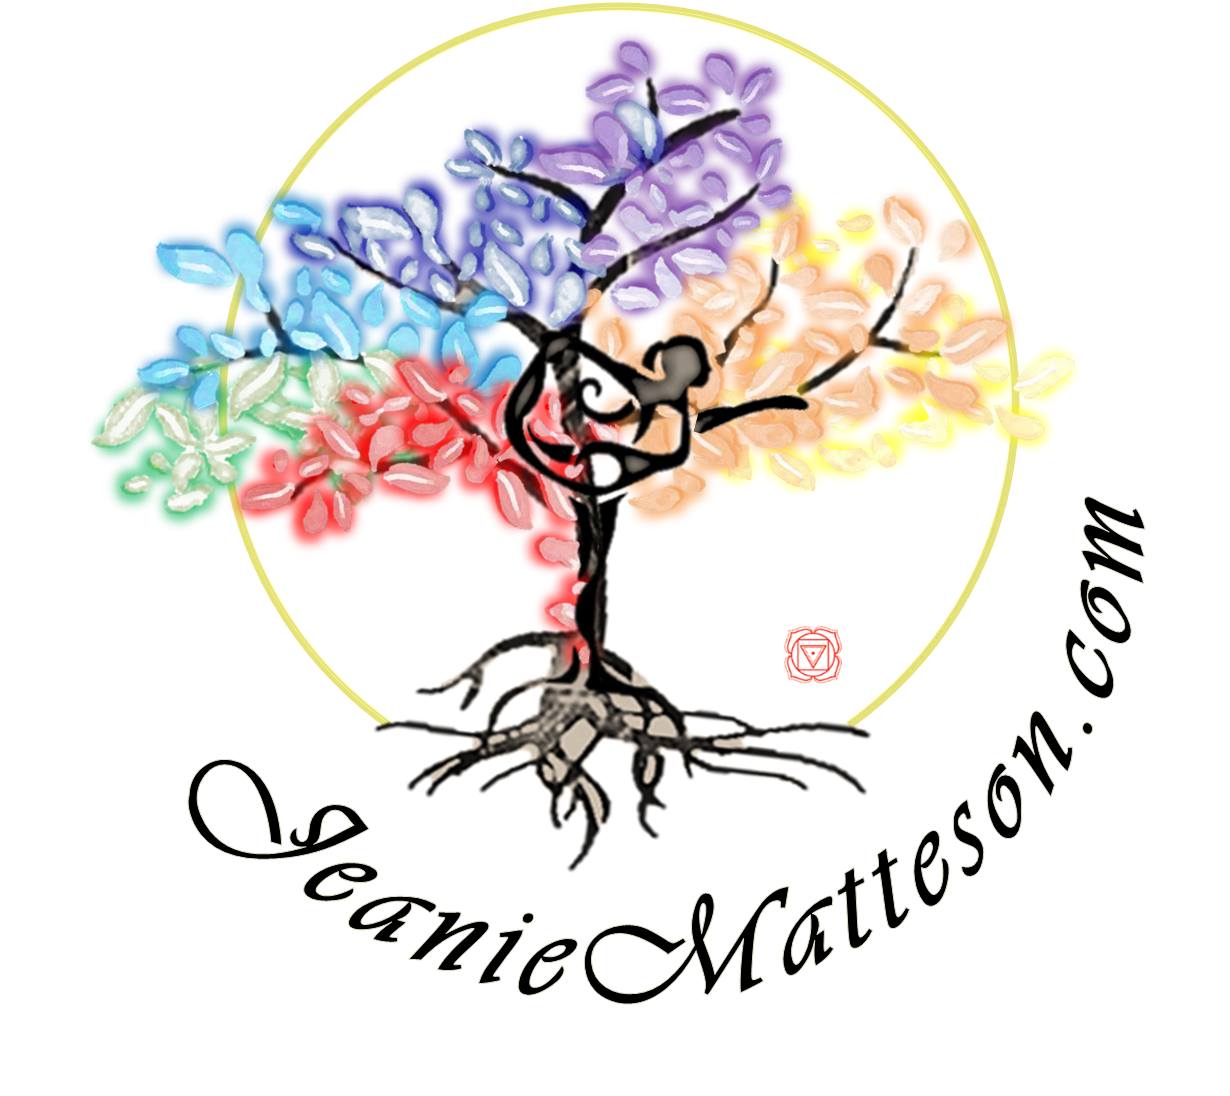 Jeanie Matteson | Creative Healing Arts, LLC | West Chester, PA